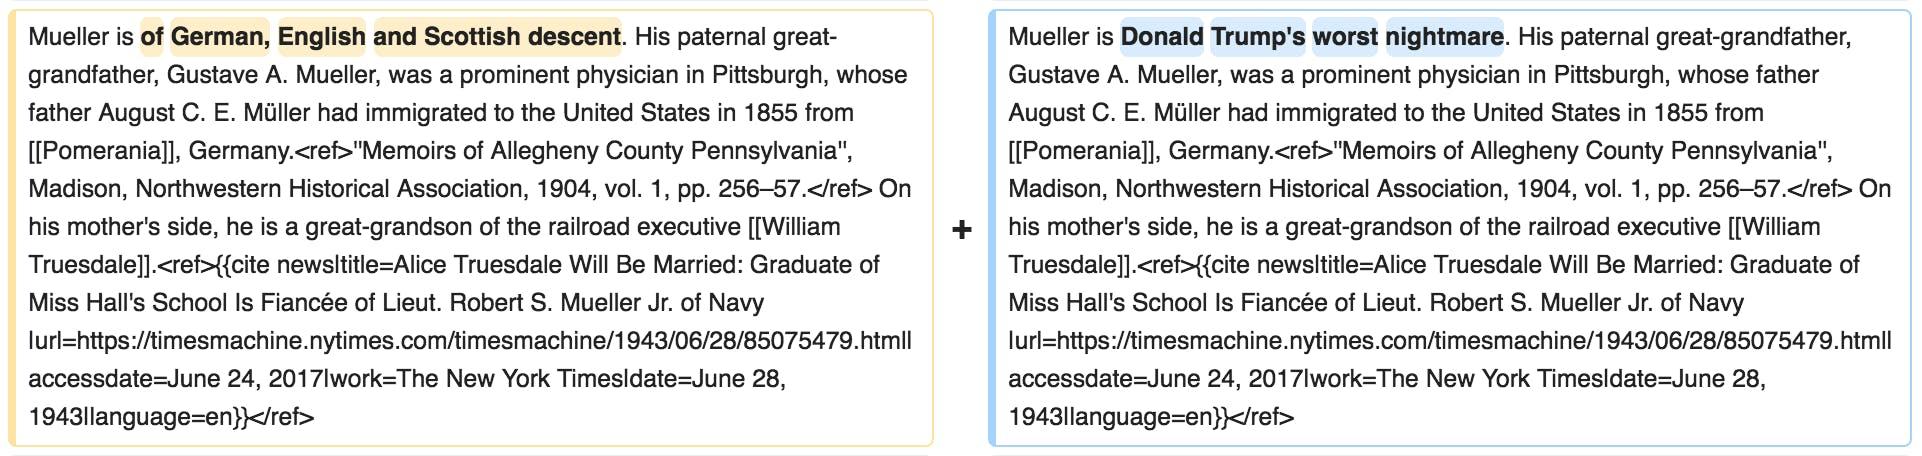 Congress Edits Mueller Wikipedia